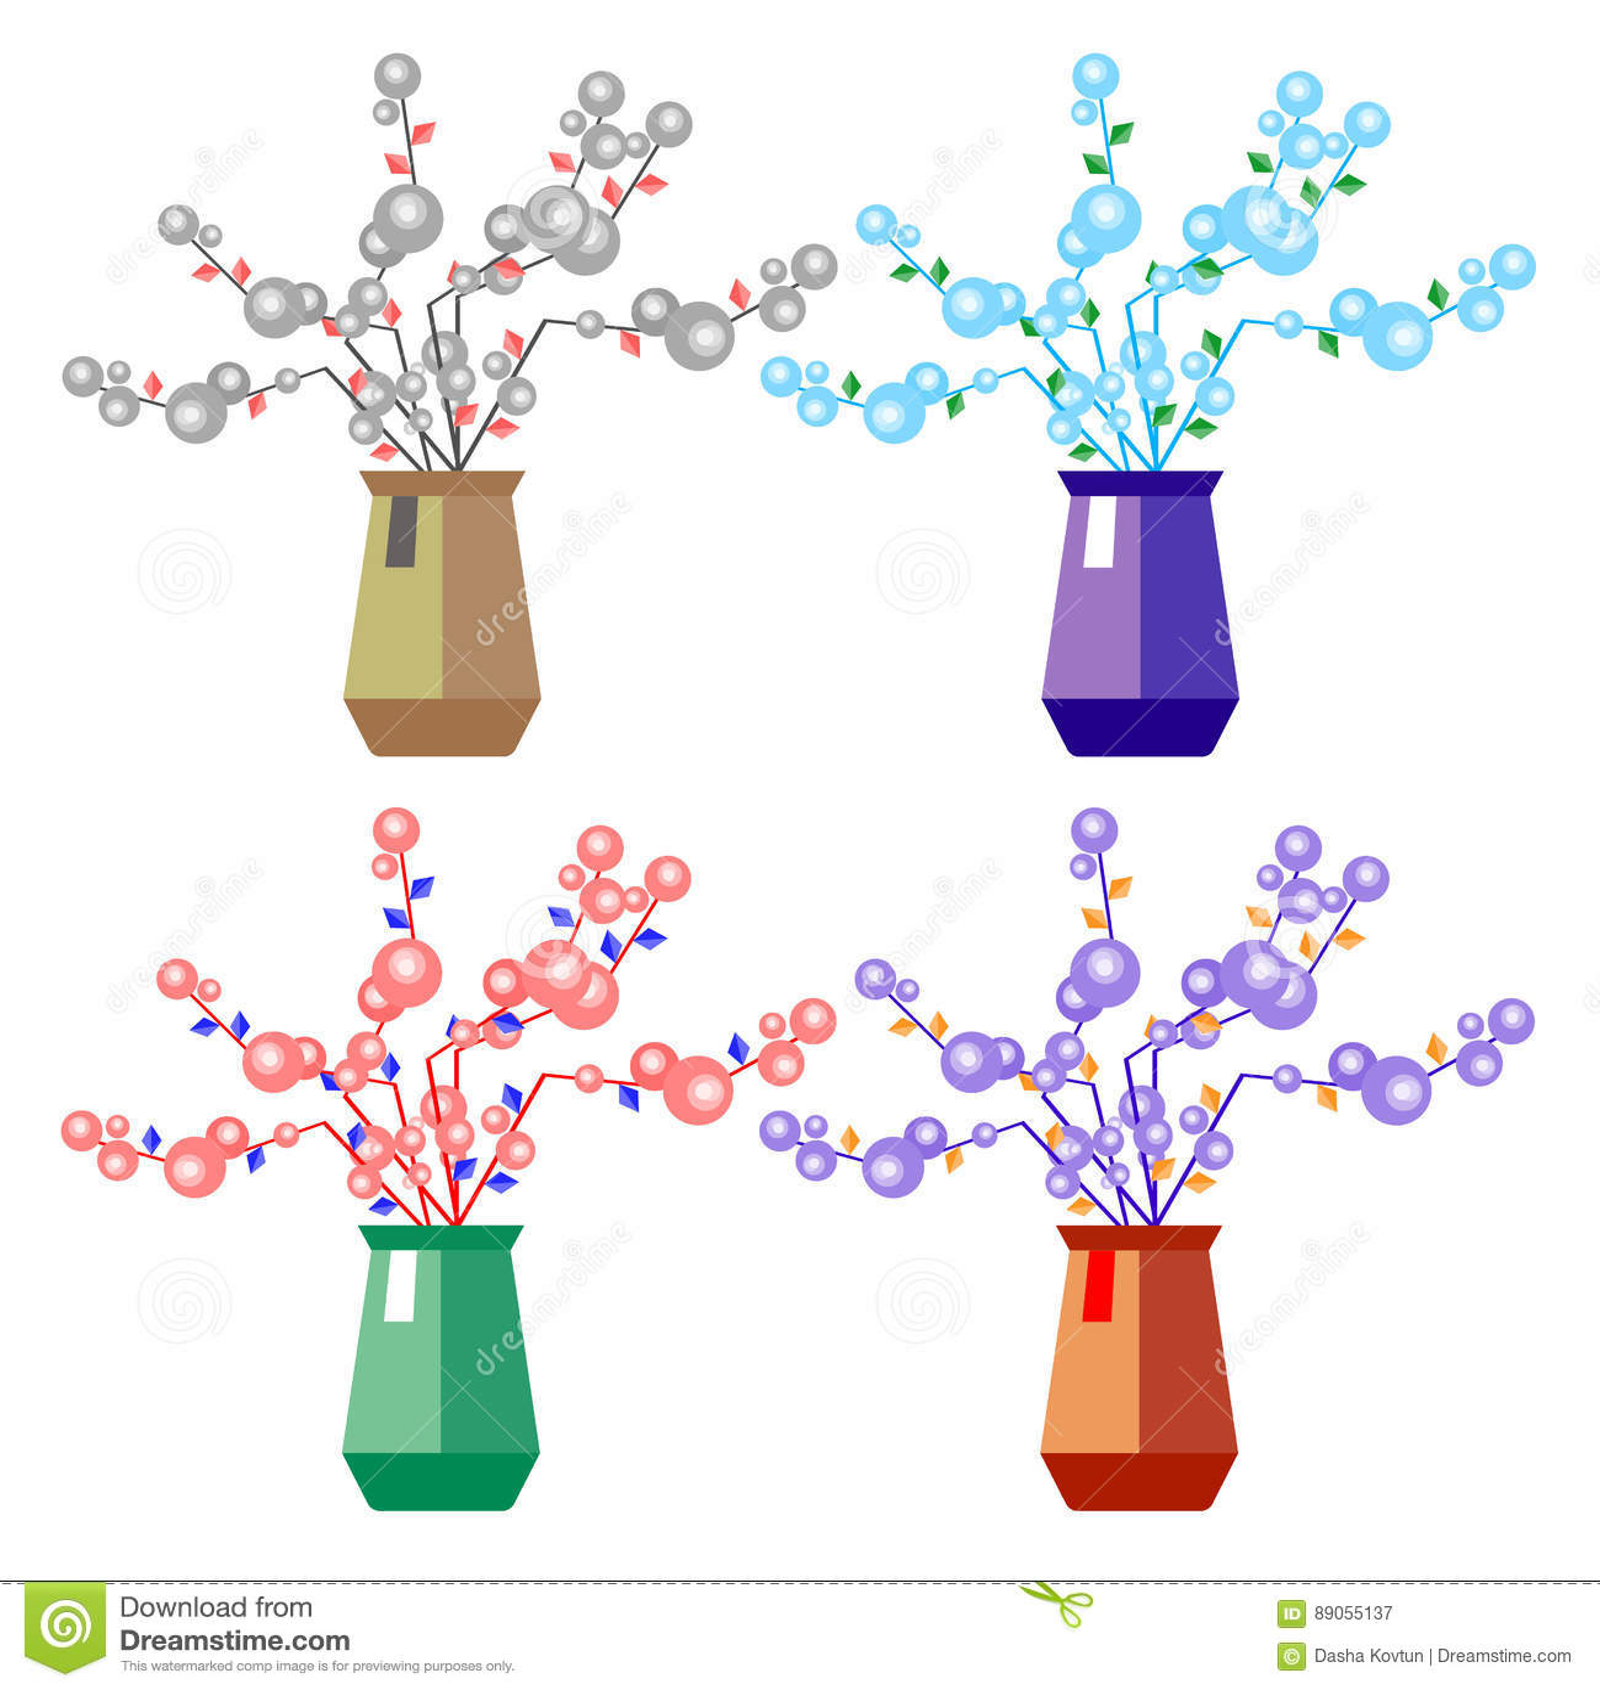 Flower Vase Vector Decoration Illustration Decorative Nature ... on books vector, basket vector, art vector, box vector, decor vector, candle vector, animals vector, roses vector, floral vector, pottery vector, mirror vector, beer mug vector, teapot vector,